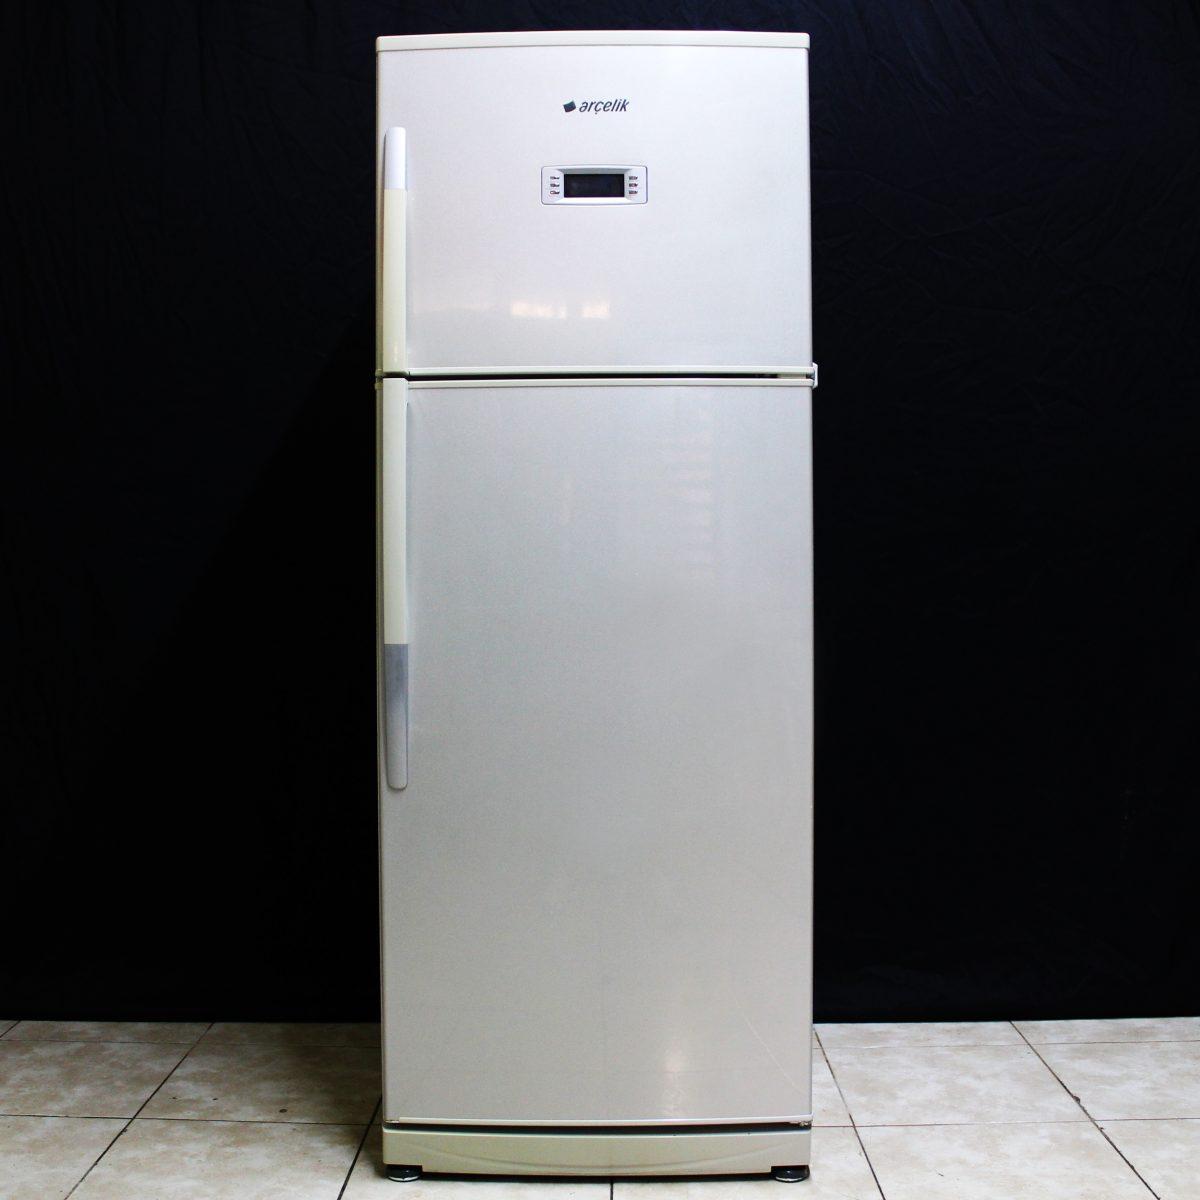 Arçelik İkinci El Buzdolabı 196x74x73